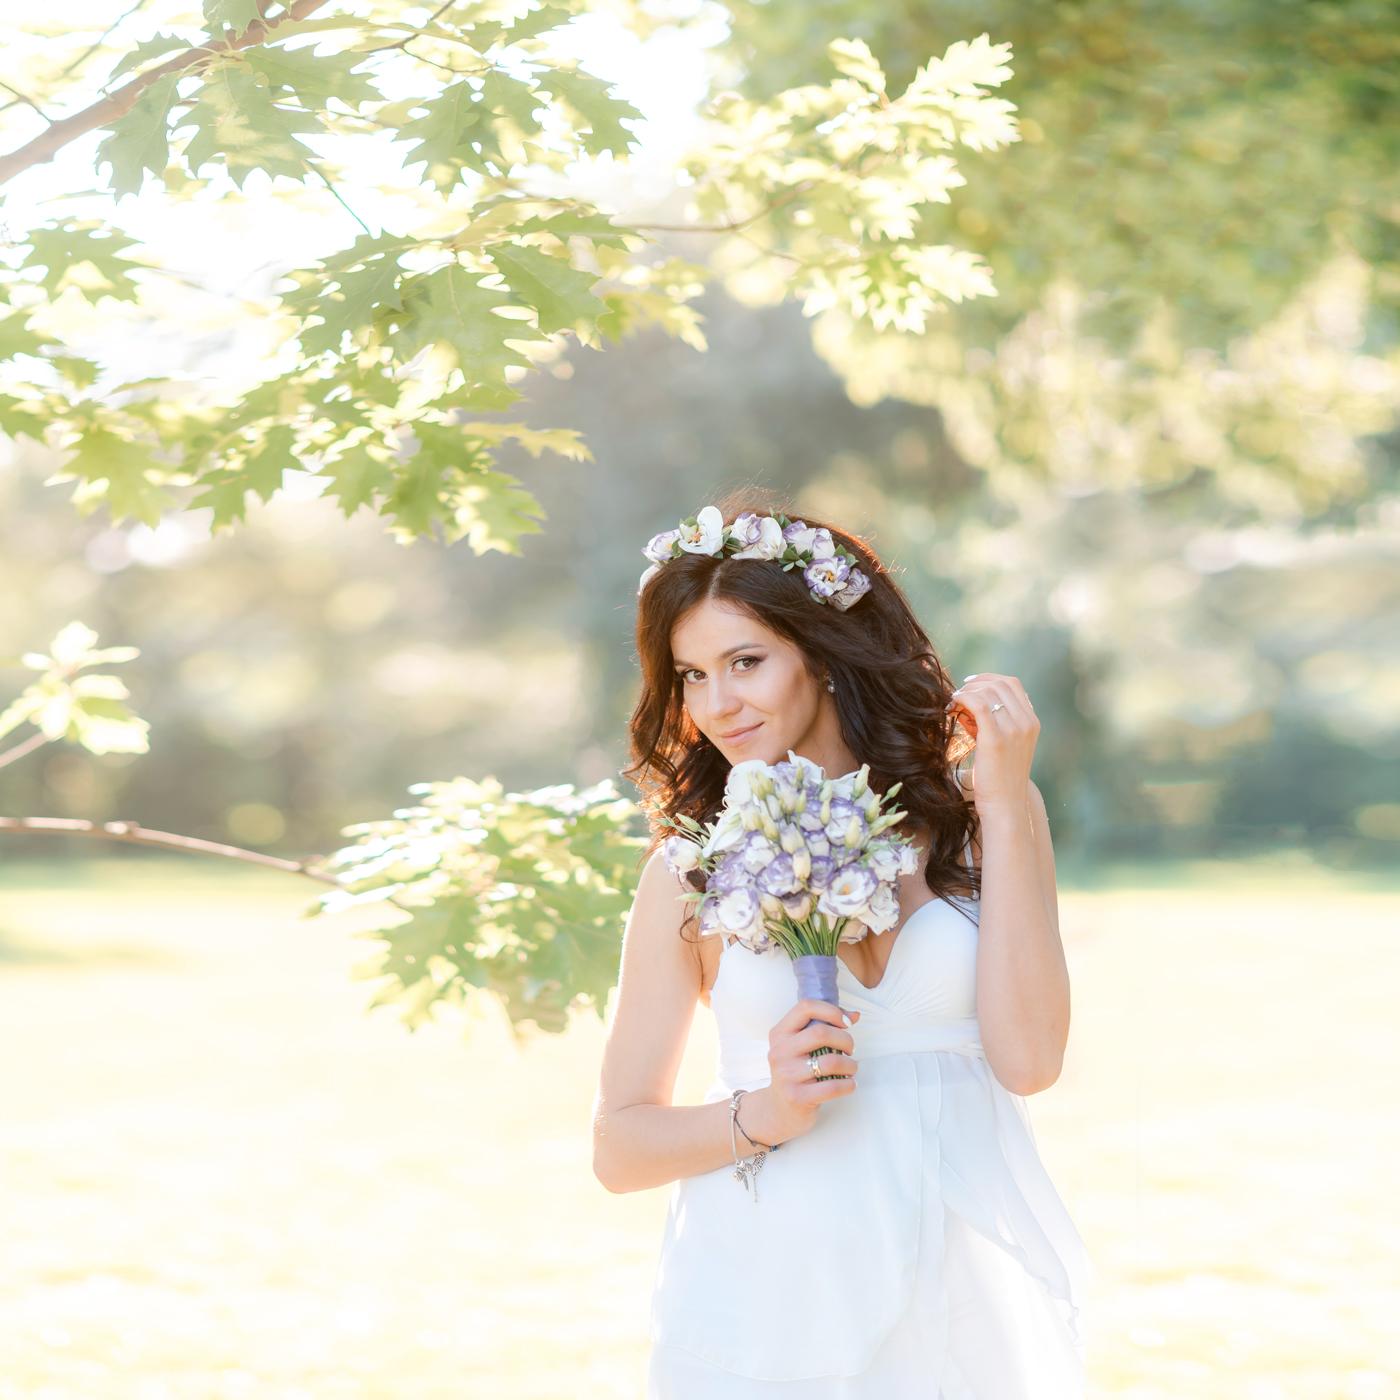 услуги фотографа на свадьбу москва